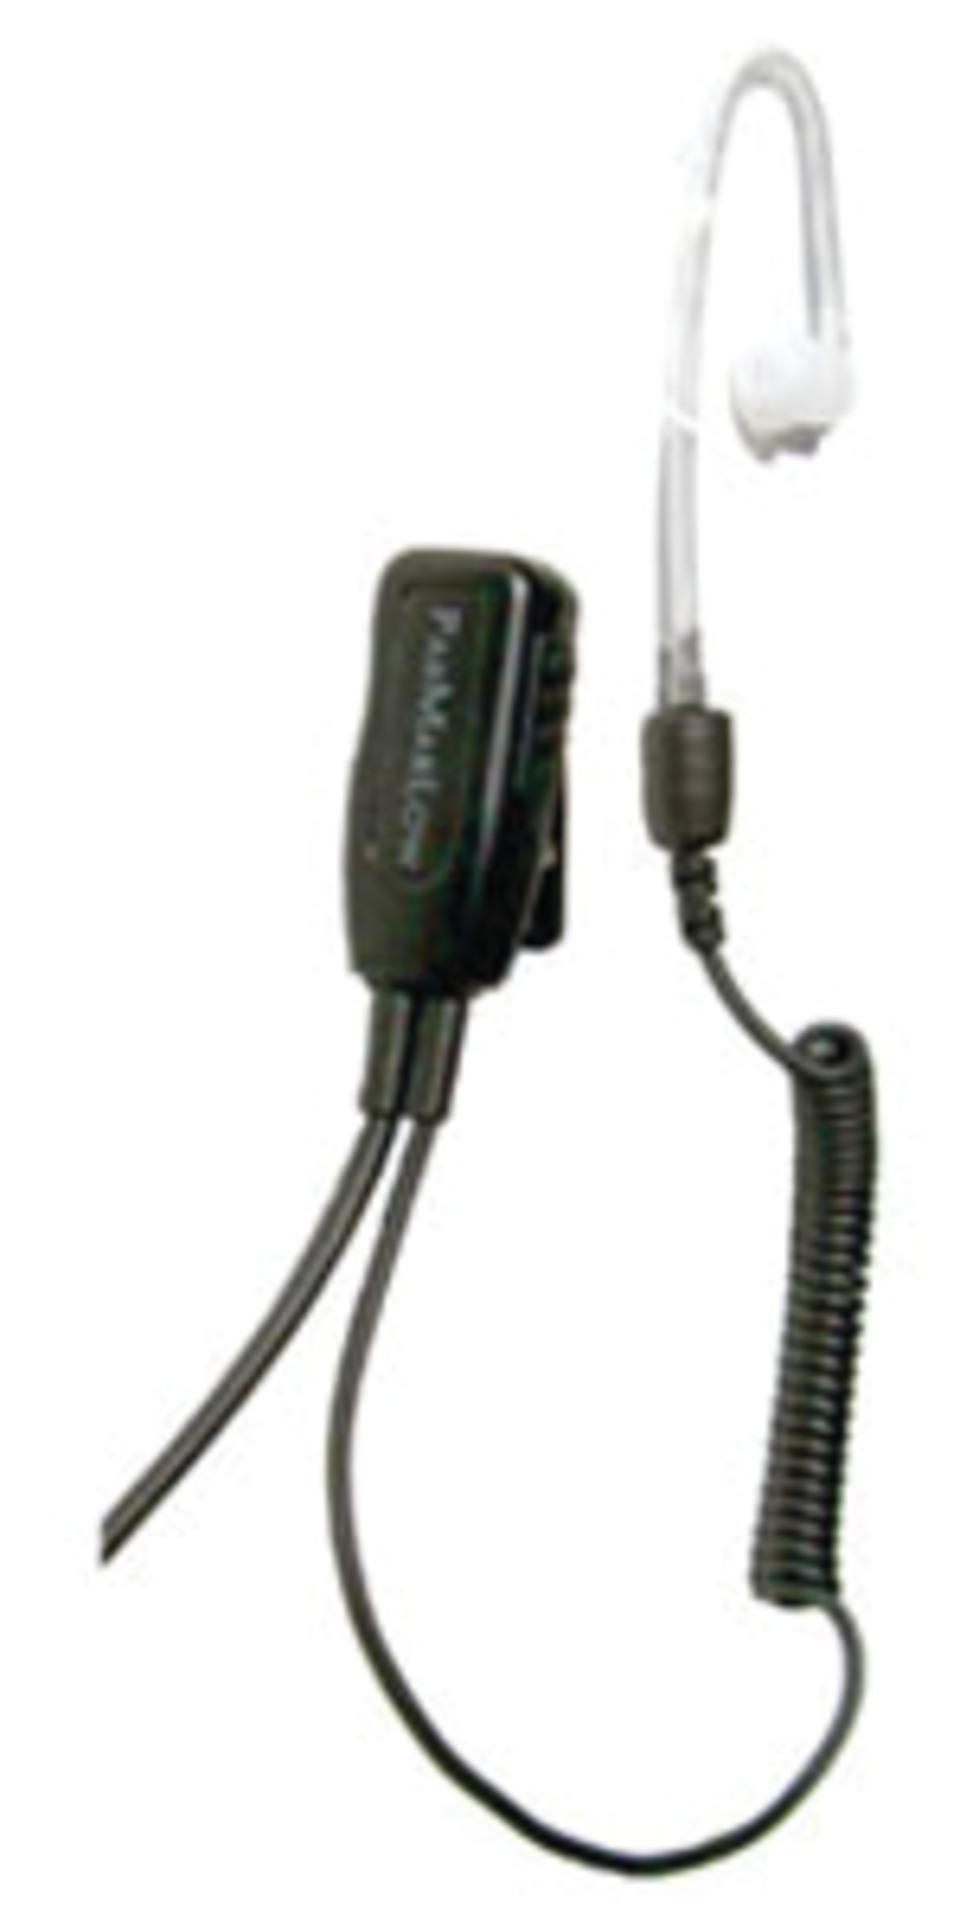 EarPhones4U ParMarLow RS-1400 Single Wire Shroud for MAXON